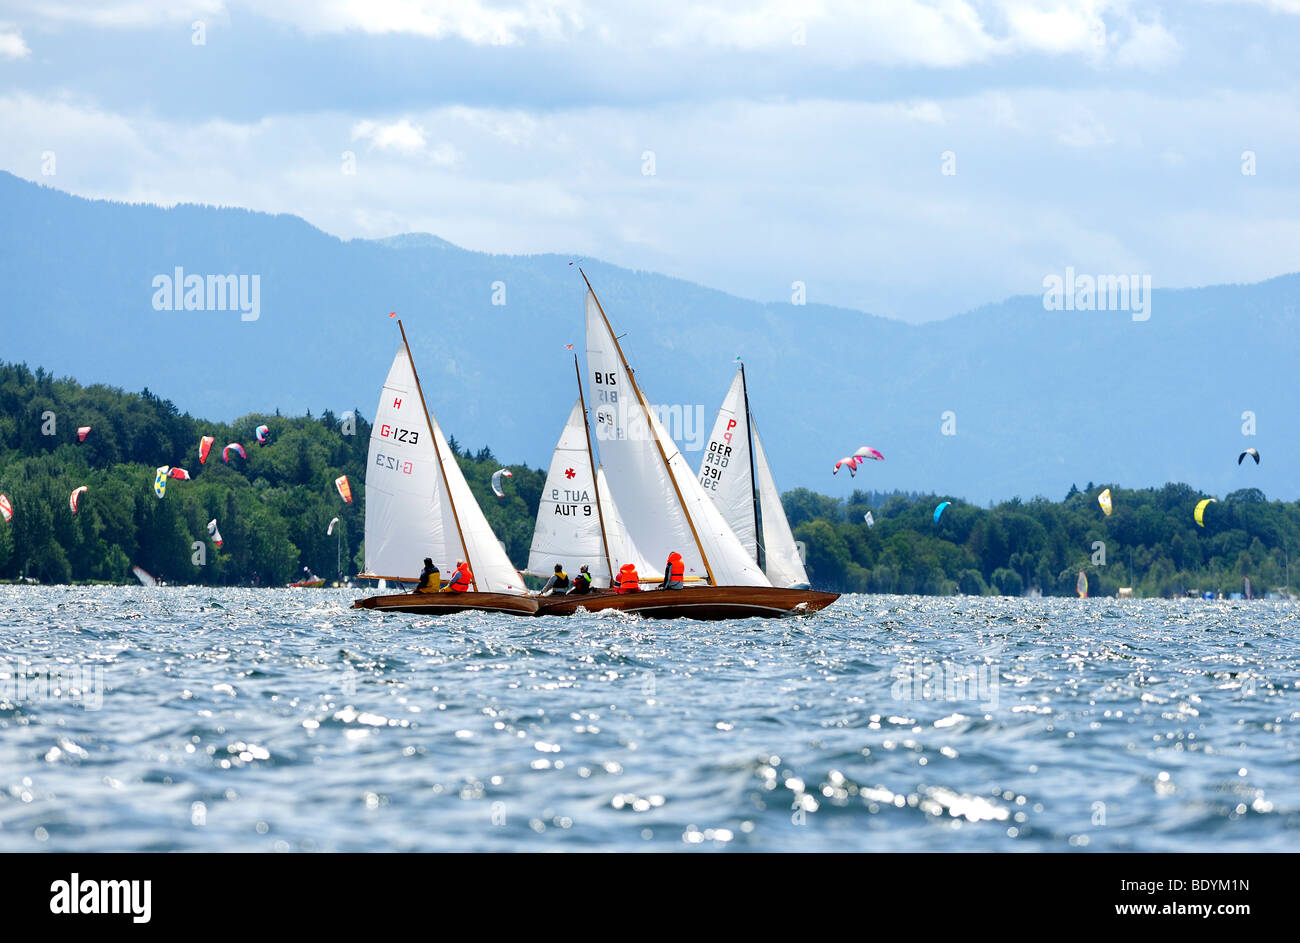 Sail boats on the Starnberger See lake, Upper Bavaria, Bavaria, Germany, Europe - Stock Image